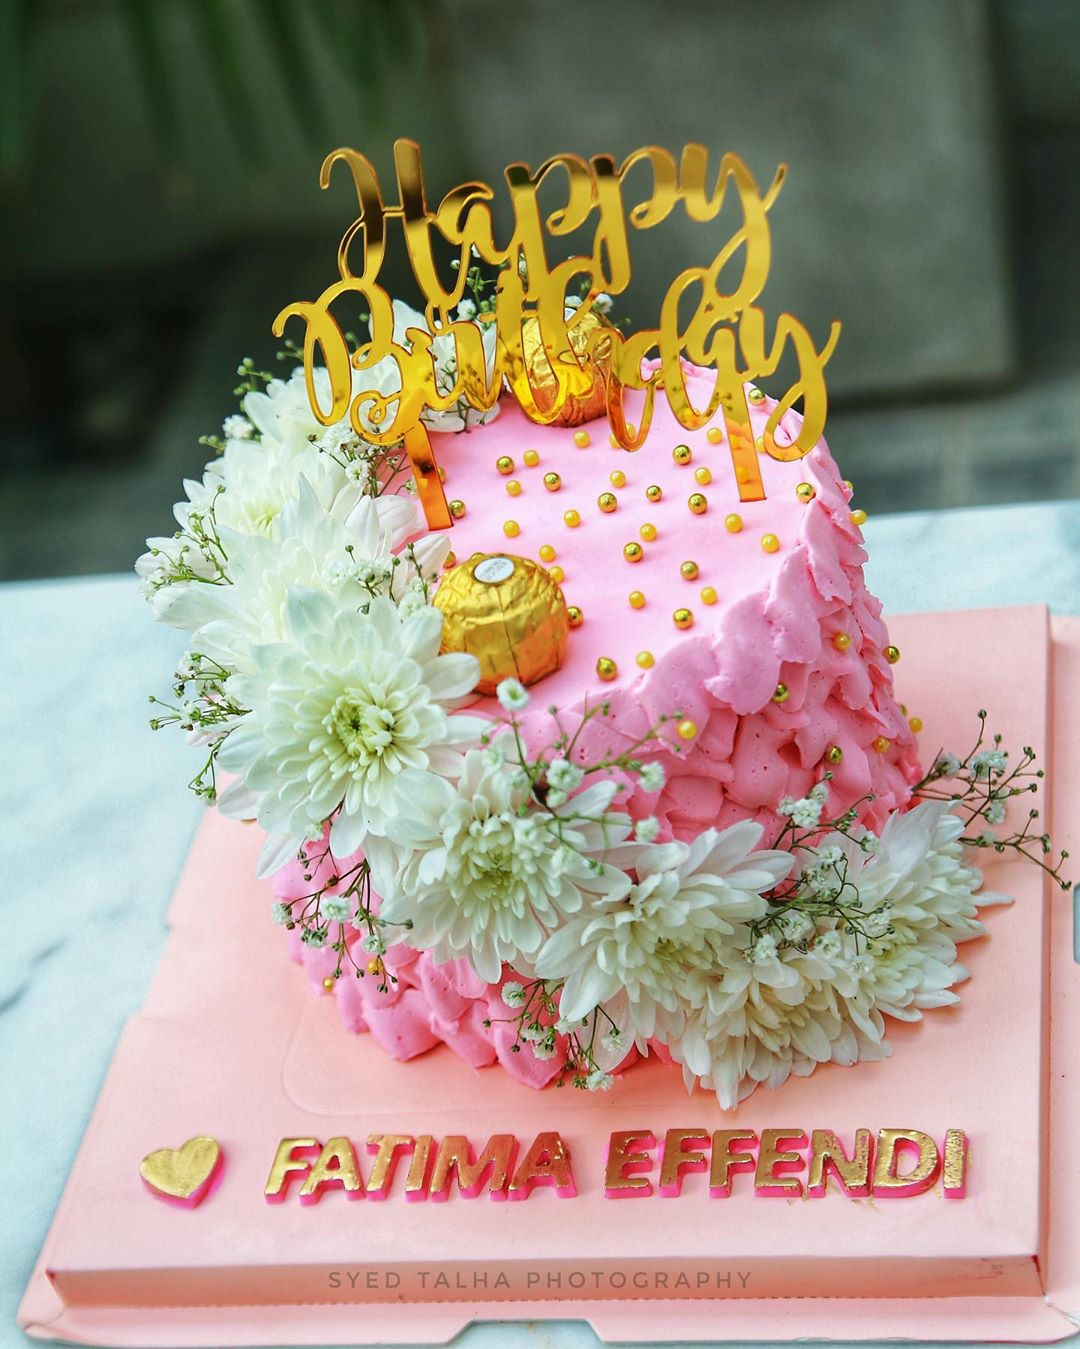 Fatima Effendi Actress Birthday Celebration with Family (9)